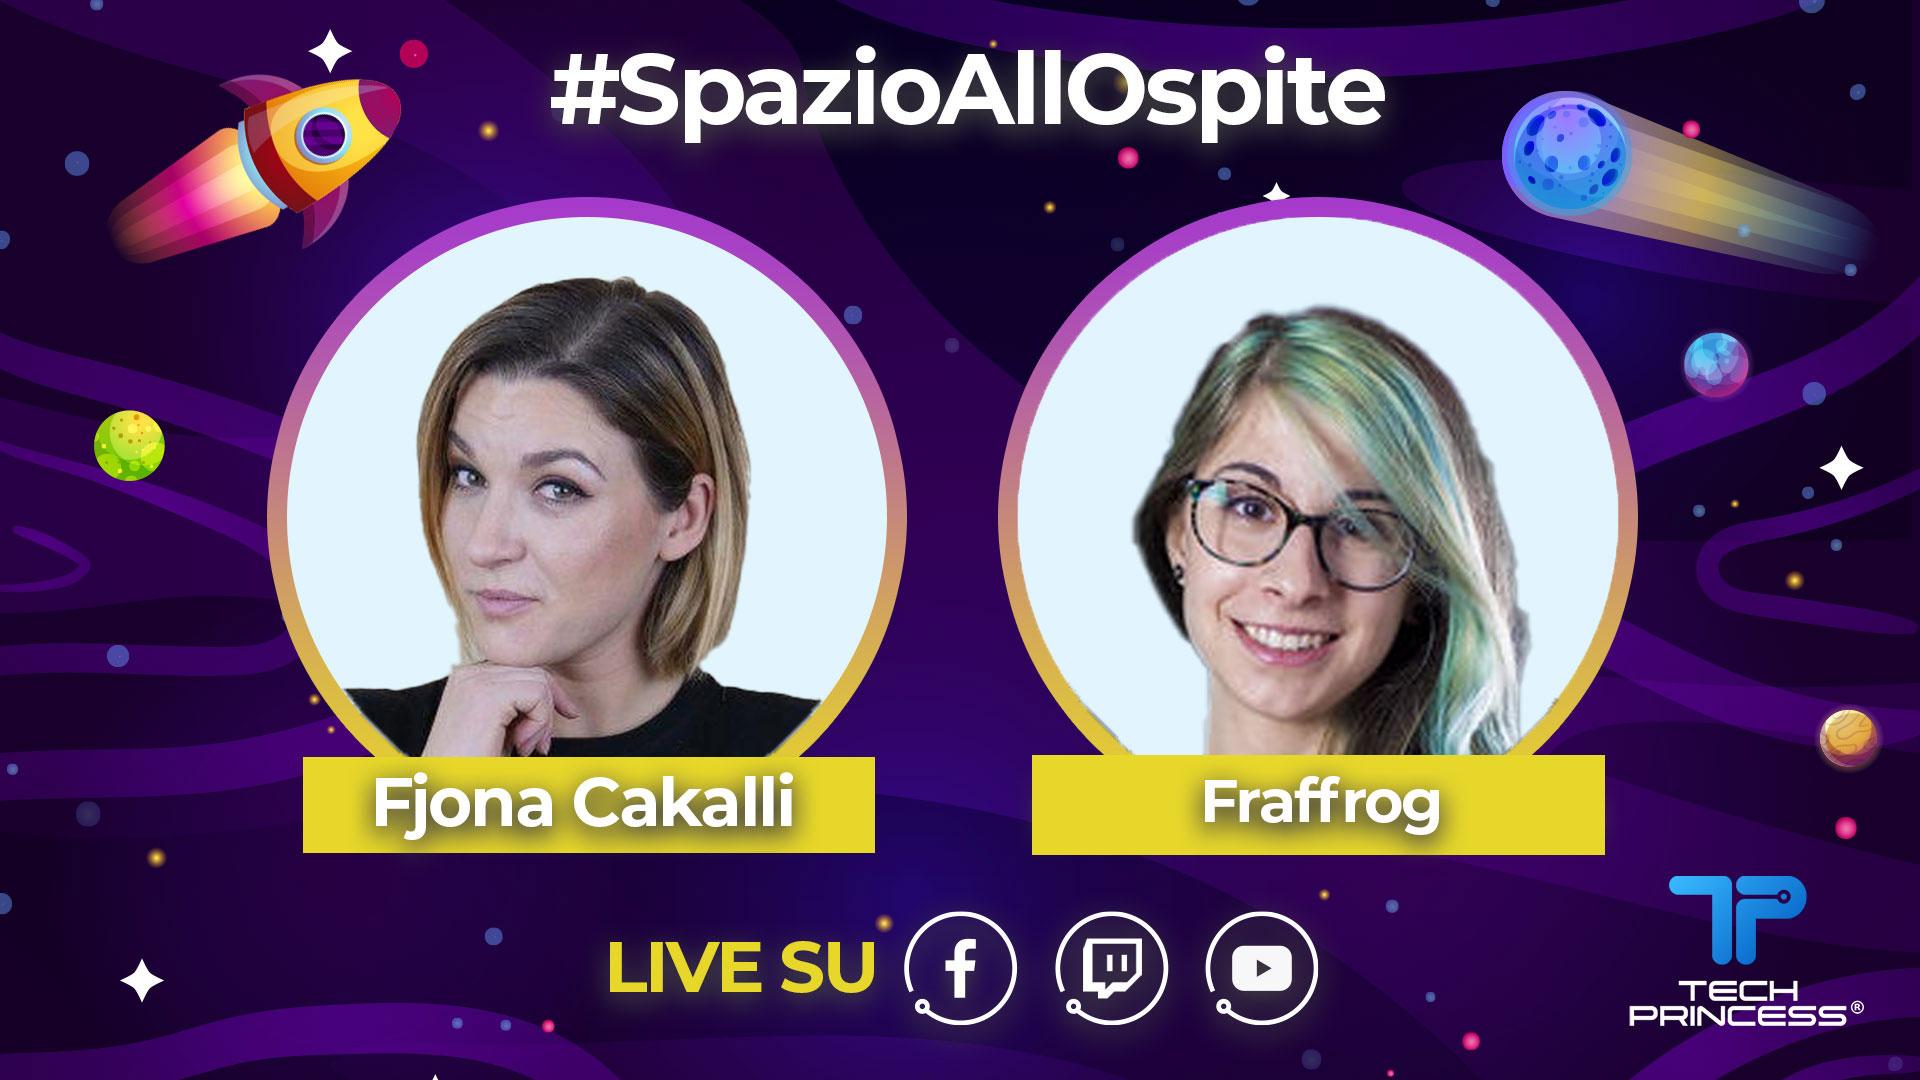 Fraffrog: intervista in diretta mercoledì 6 maggio ore 18.30 | #SpazioAllOspite thumbnail